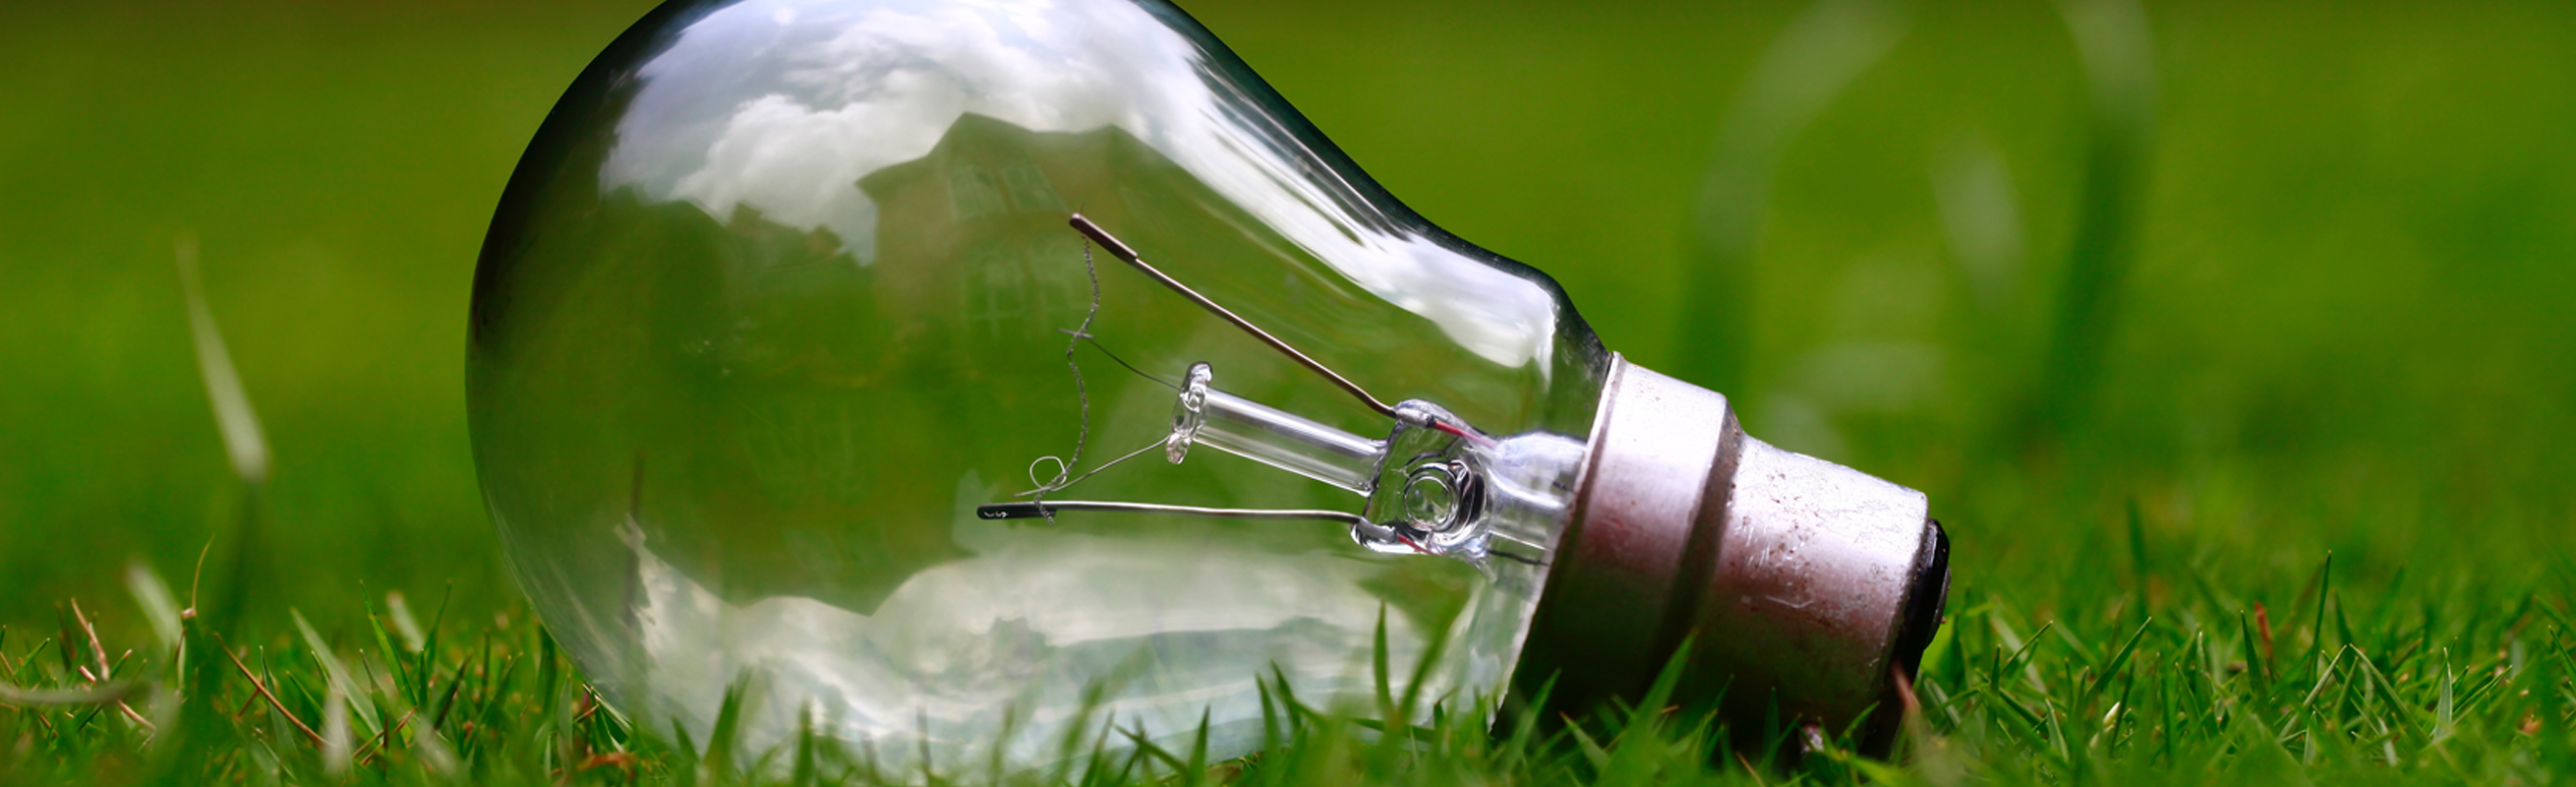 risparmio energetico 5